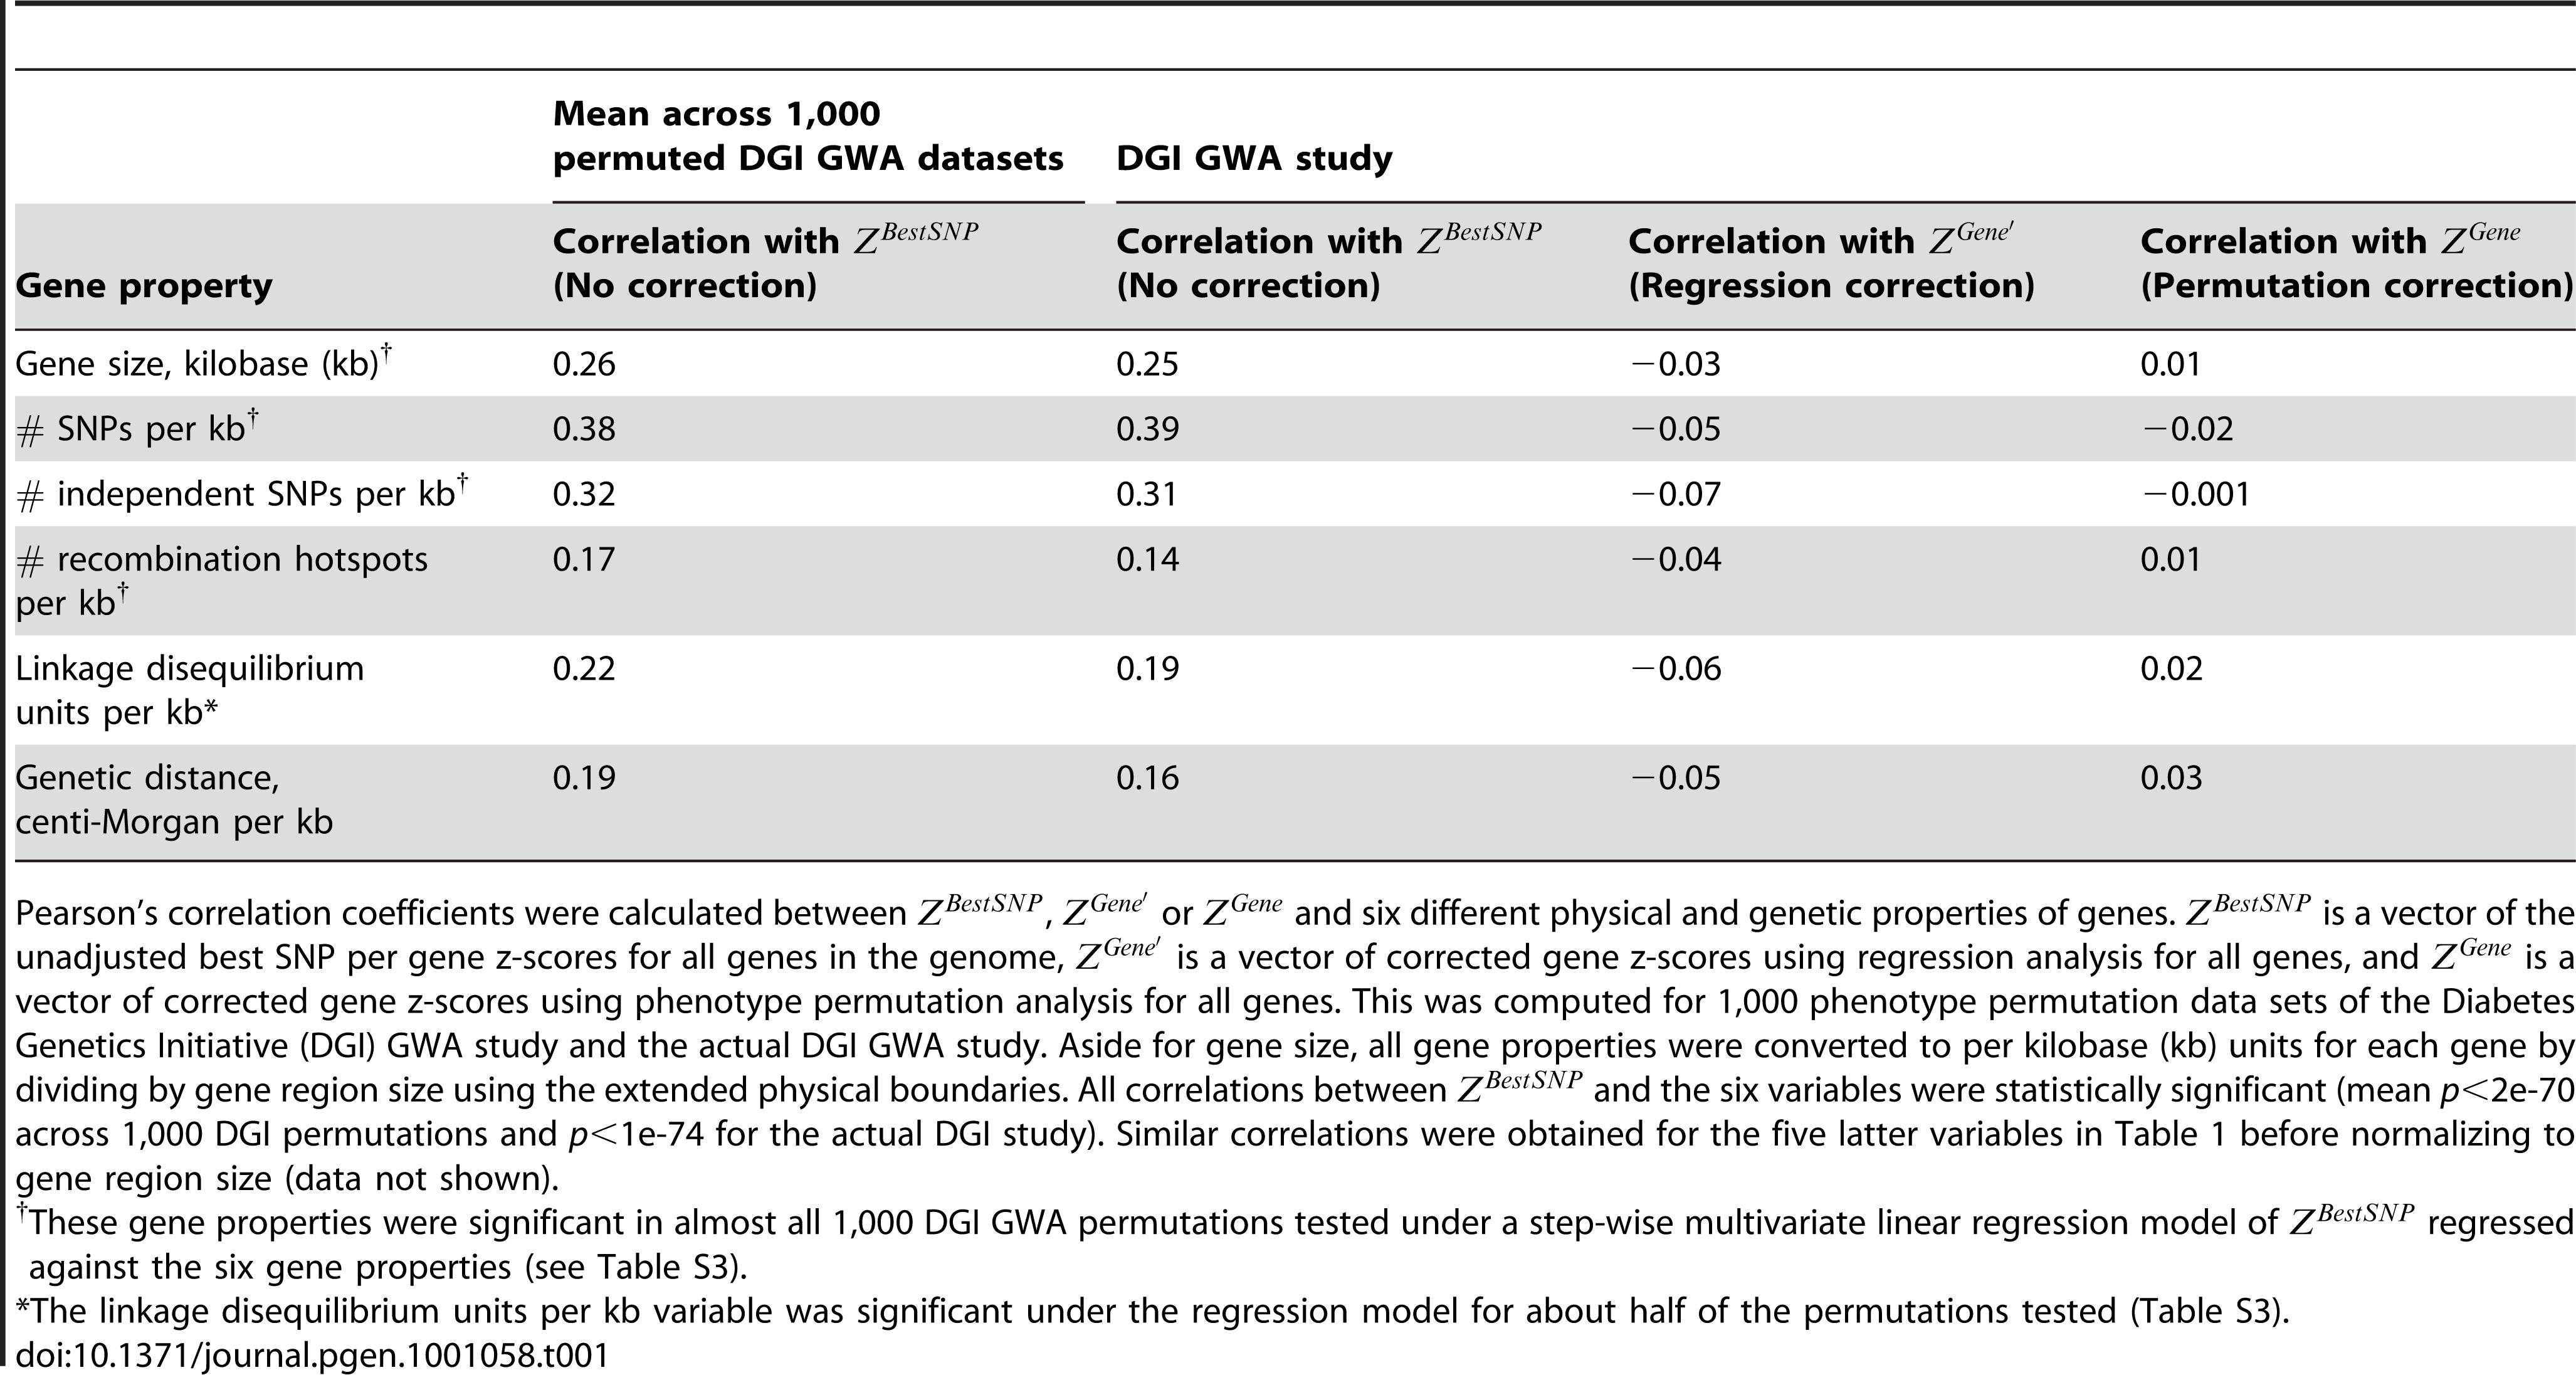 Correlation between type 2 diabetes gene association scores and potential gene score confounders.